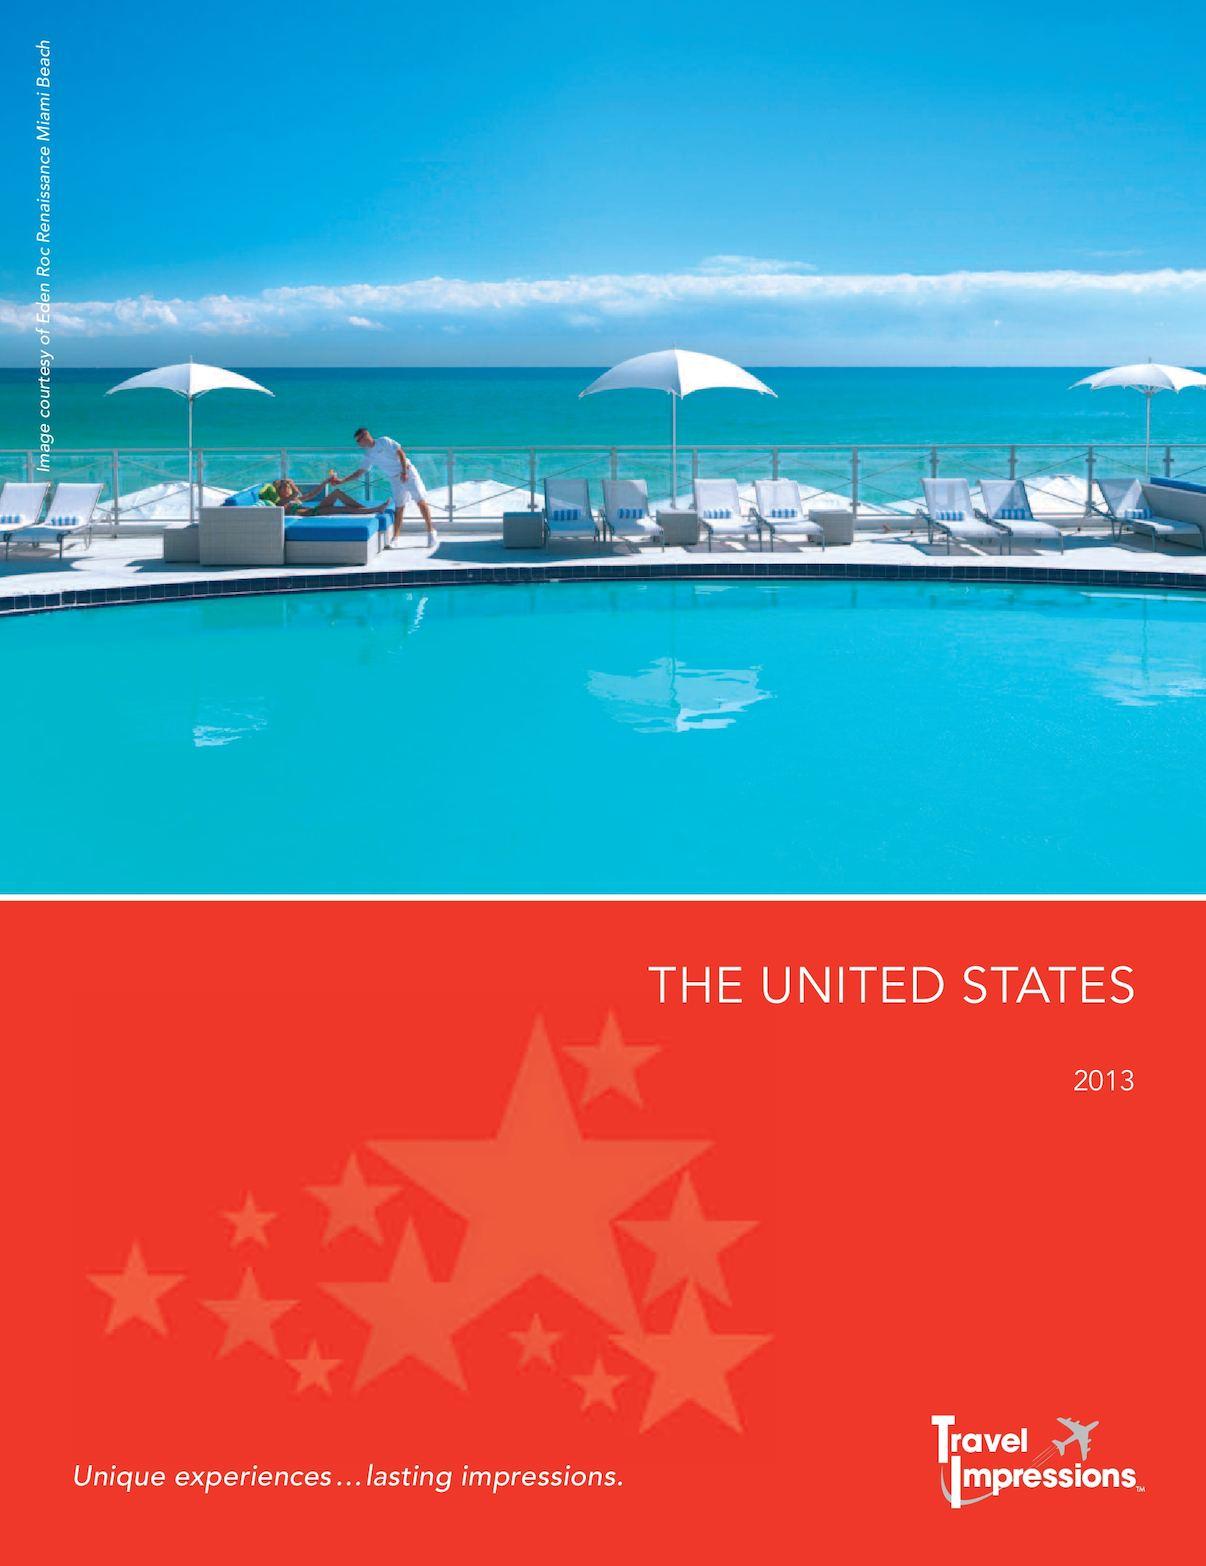 TI The United States 2013